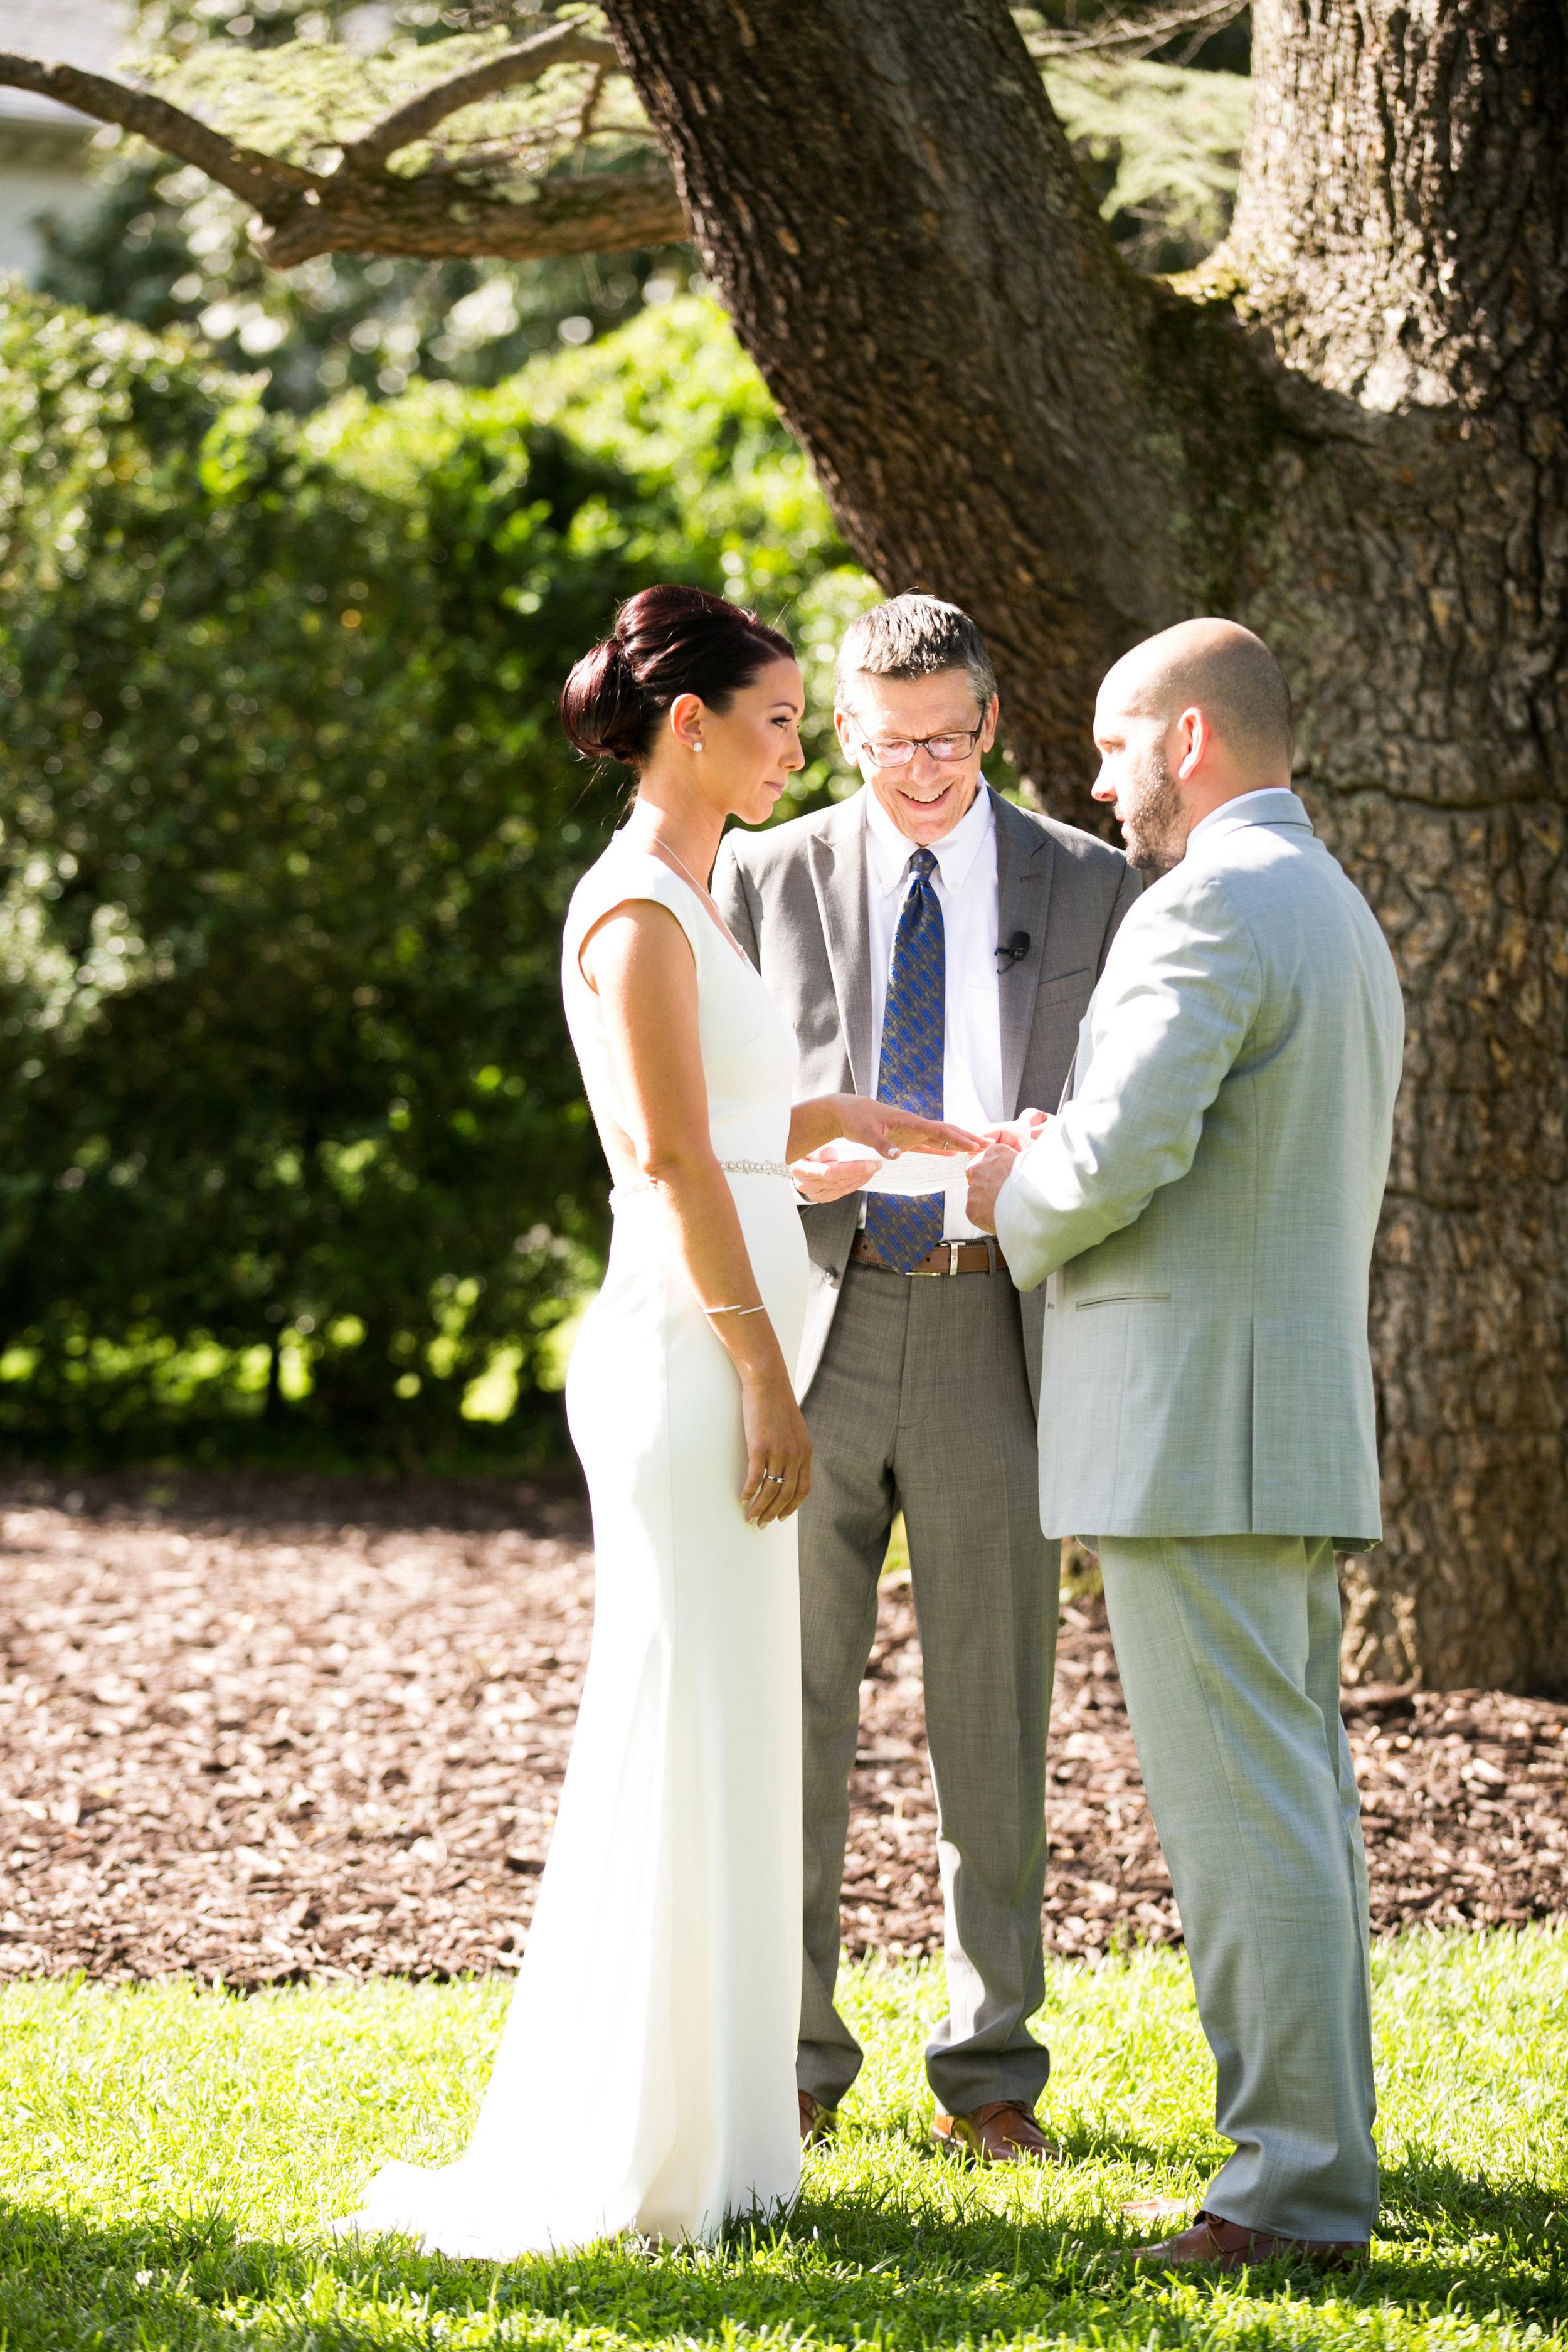 Pure elegance events Tynise Kee dc wedding planner va wedding planner rust manor house leesburg -0043.jpg